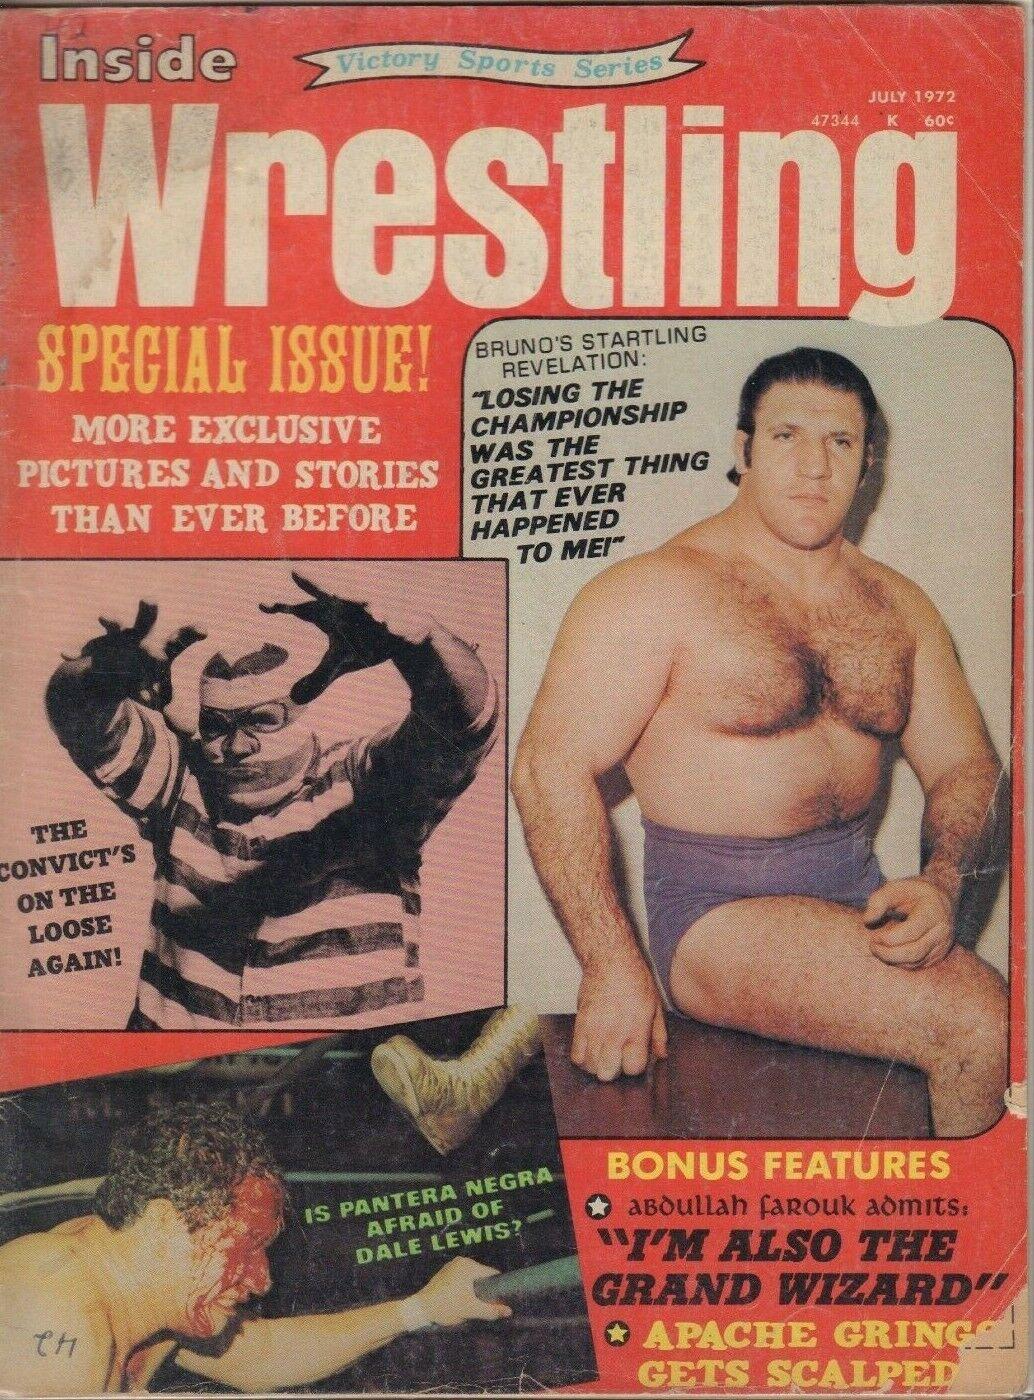 Inside Wrestling - July 1972